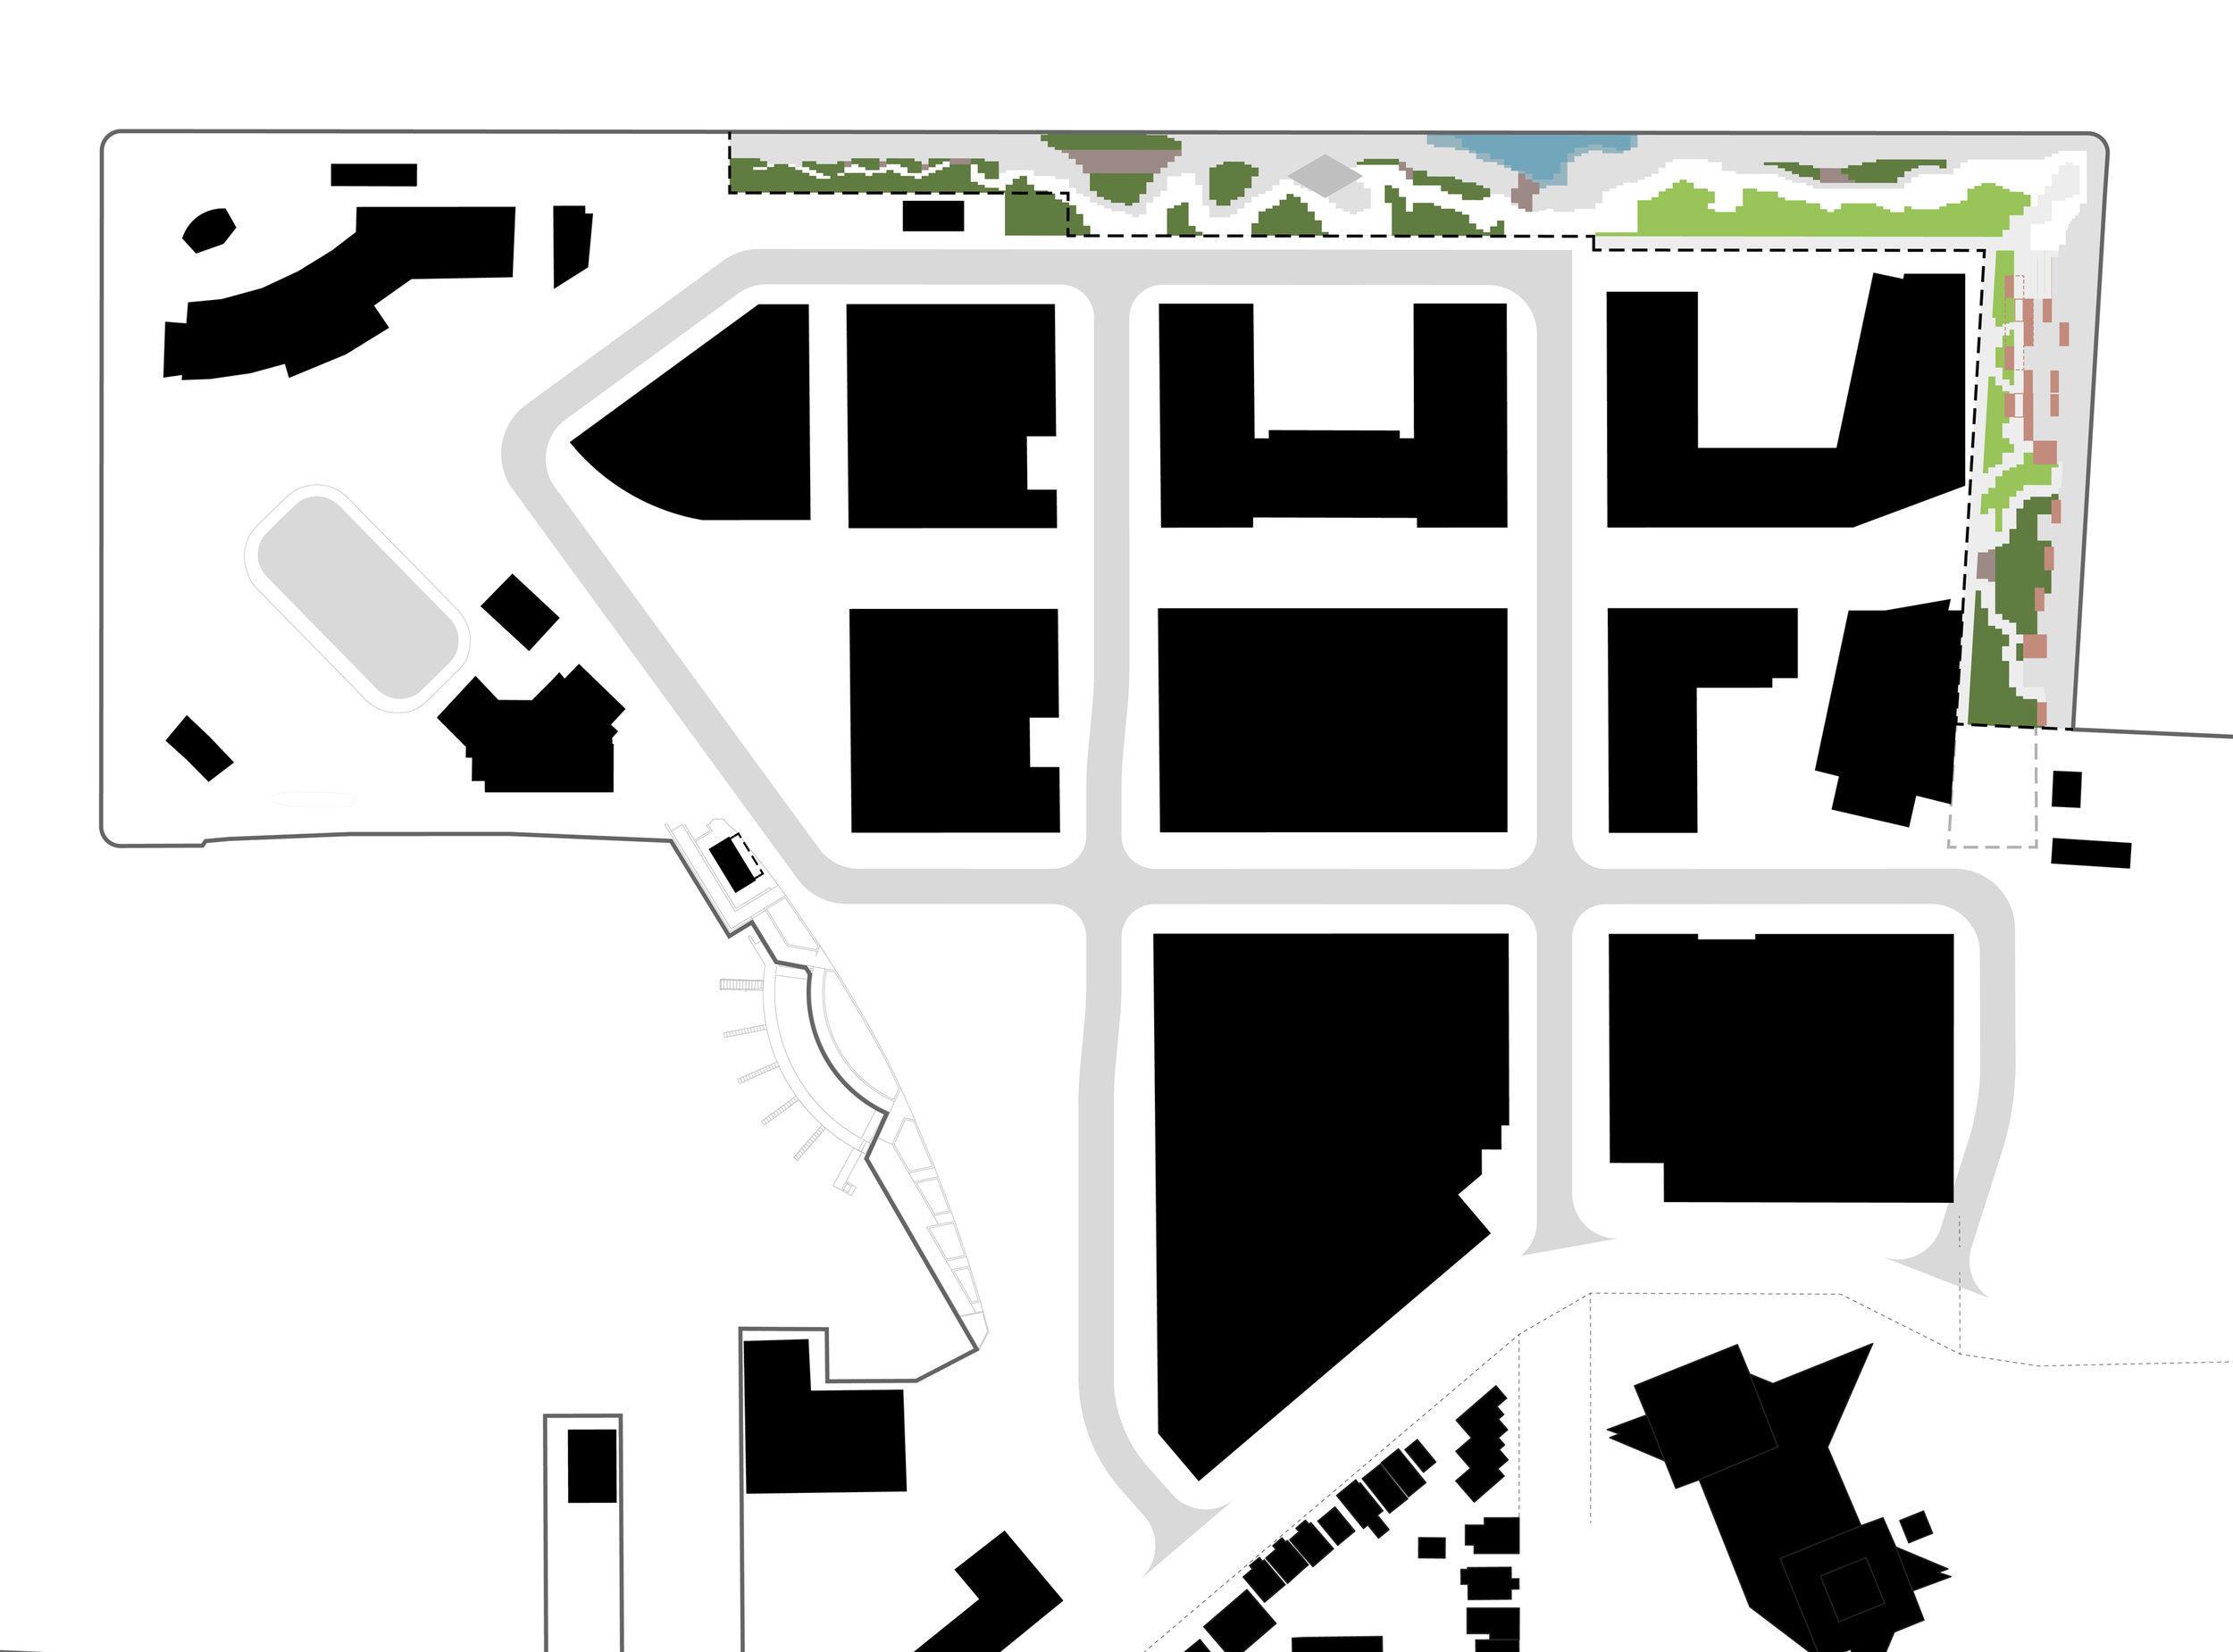 Pier 8 Promenade Park - nolli plan, context diagram